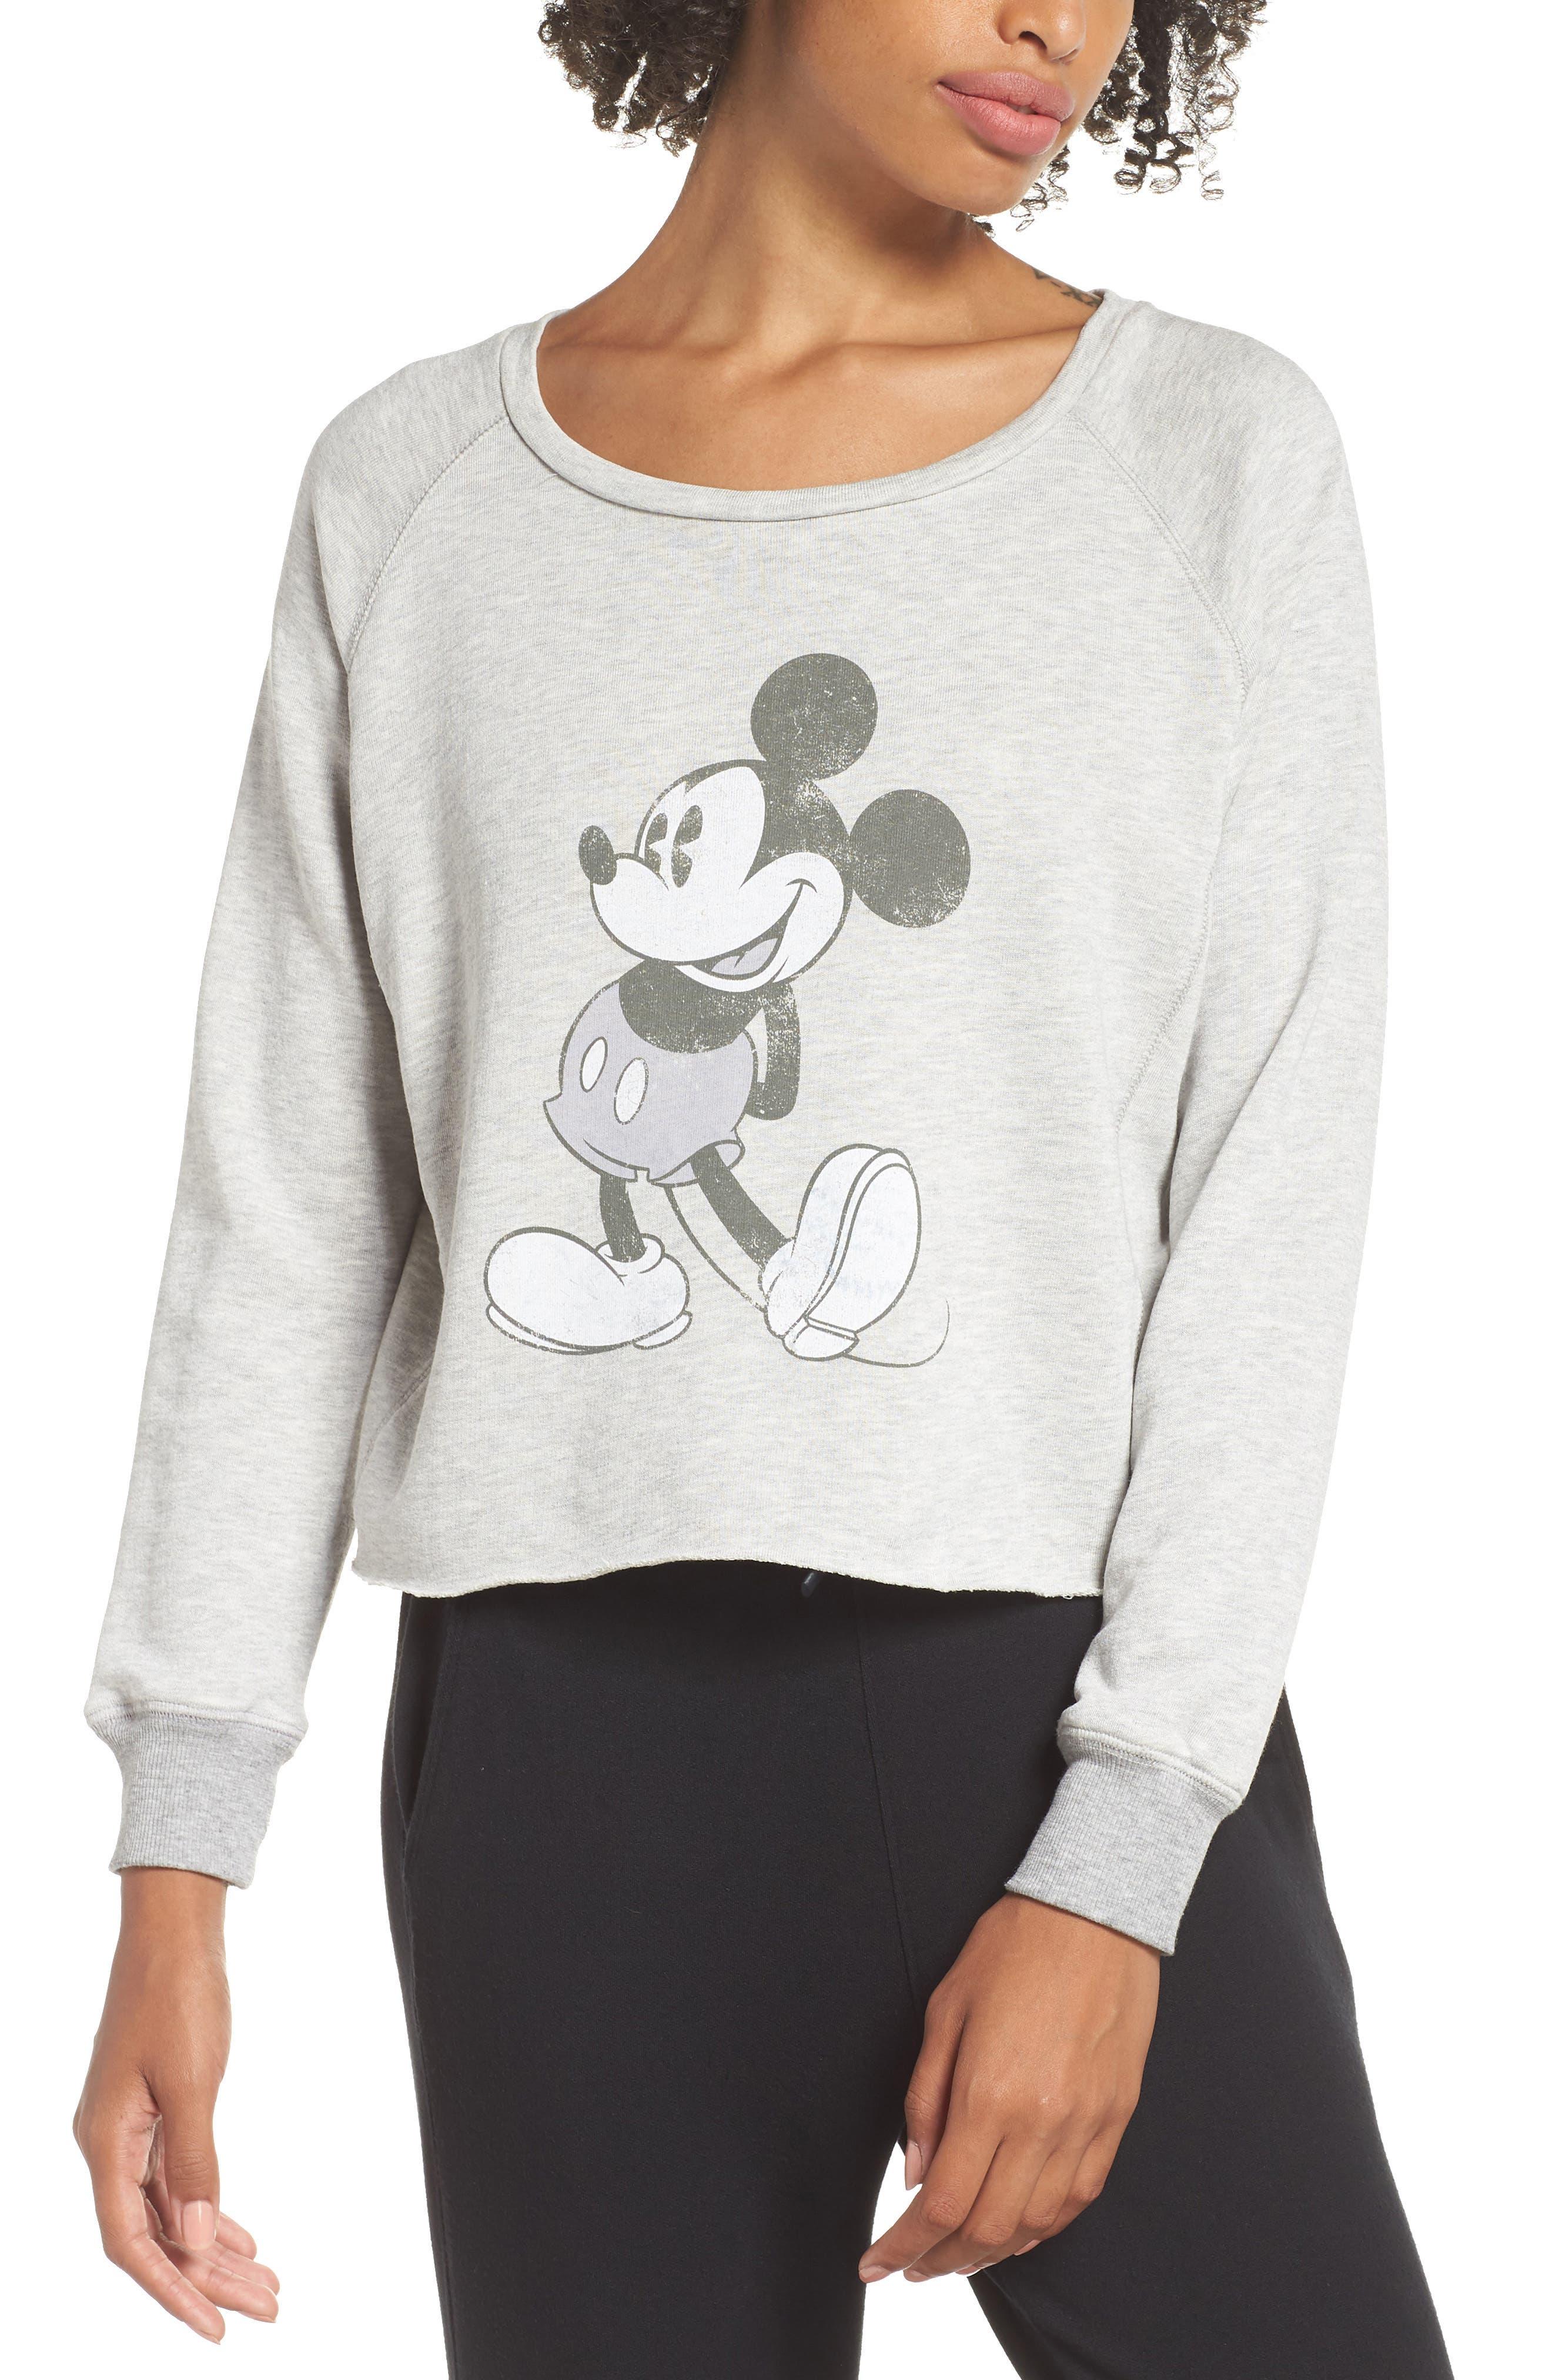 DAVID LERNER Mickey Mouse Graphic Sweatshirt in Heather Gray